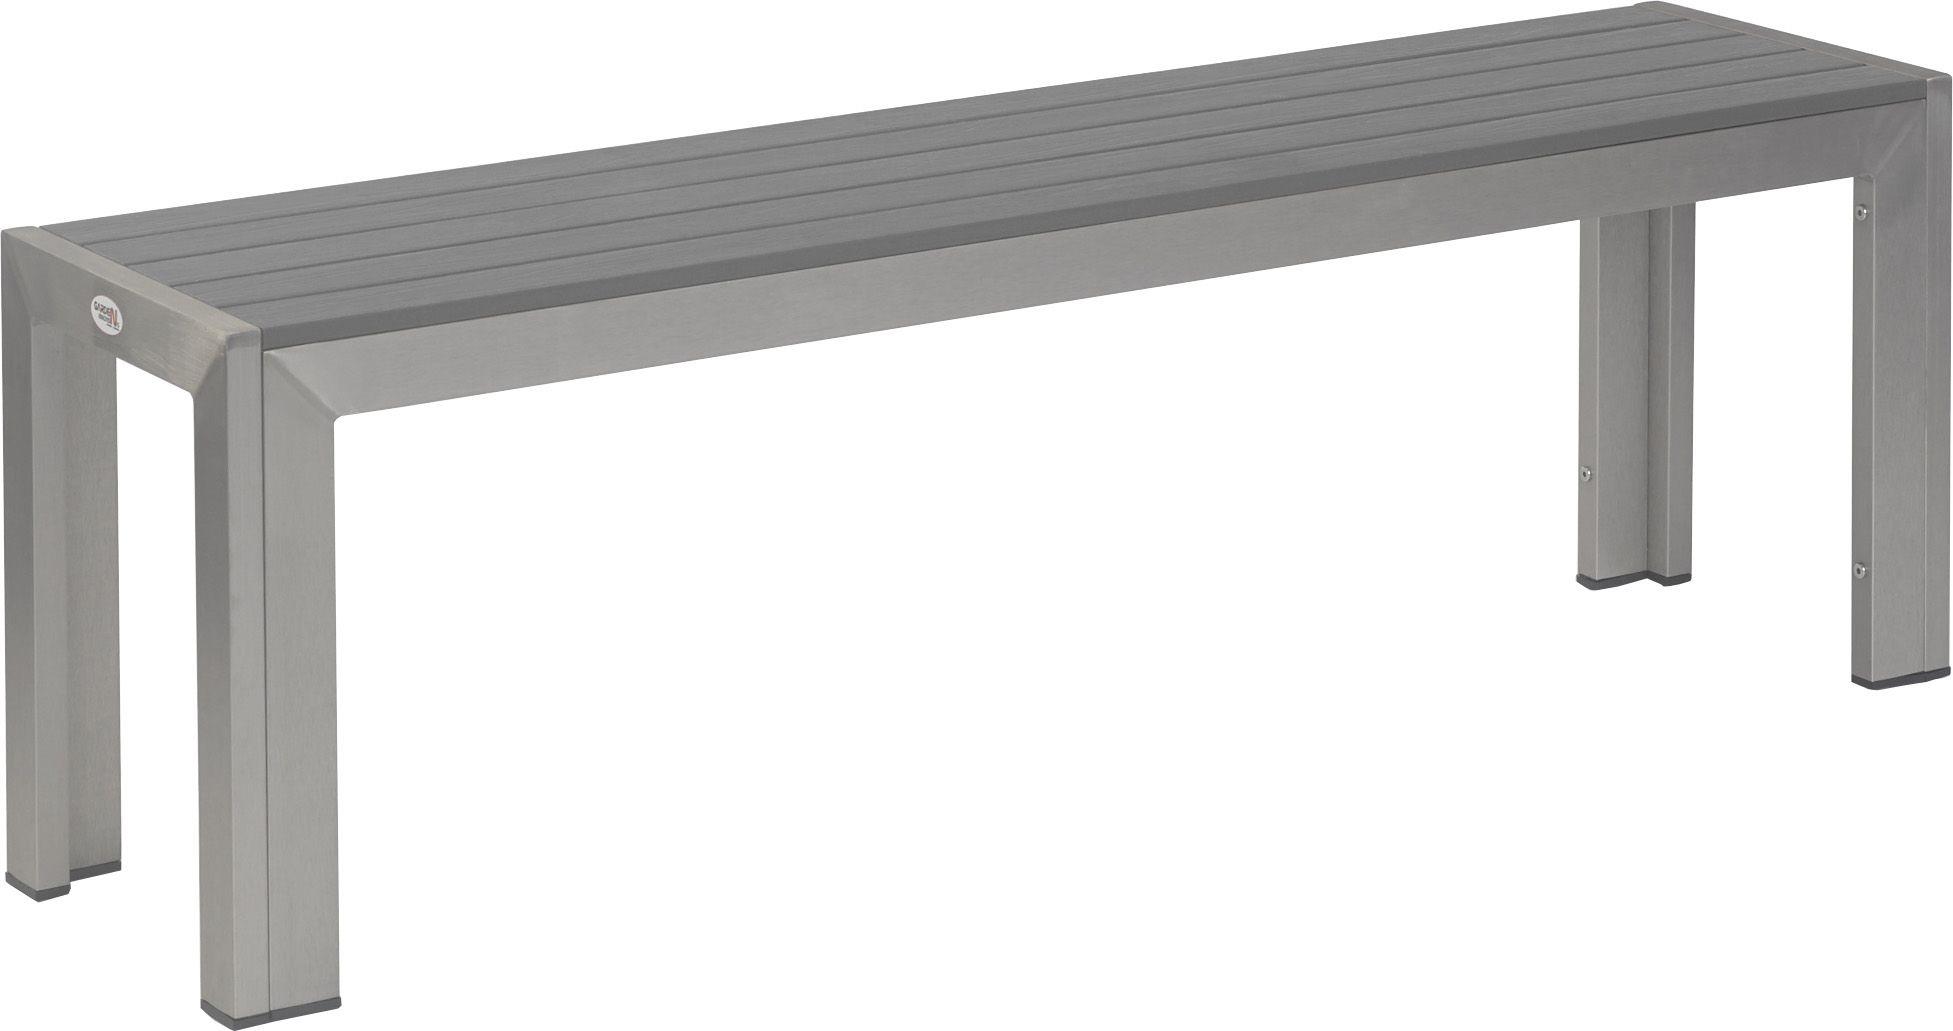 terrassenbank torino grau 140x35x46 cm g nstig kaufen m bel star. Black Bedroom Furniture Sets. Home Design Ideas